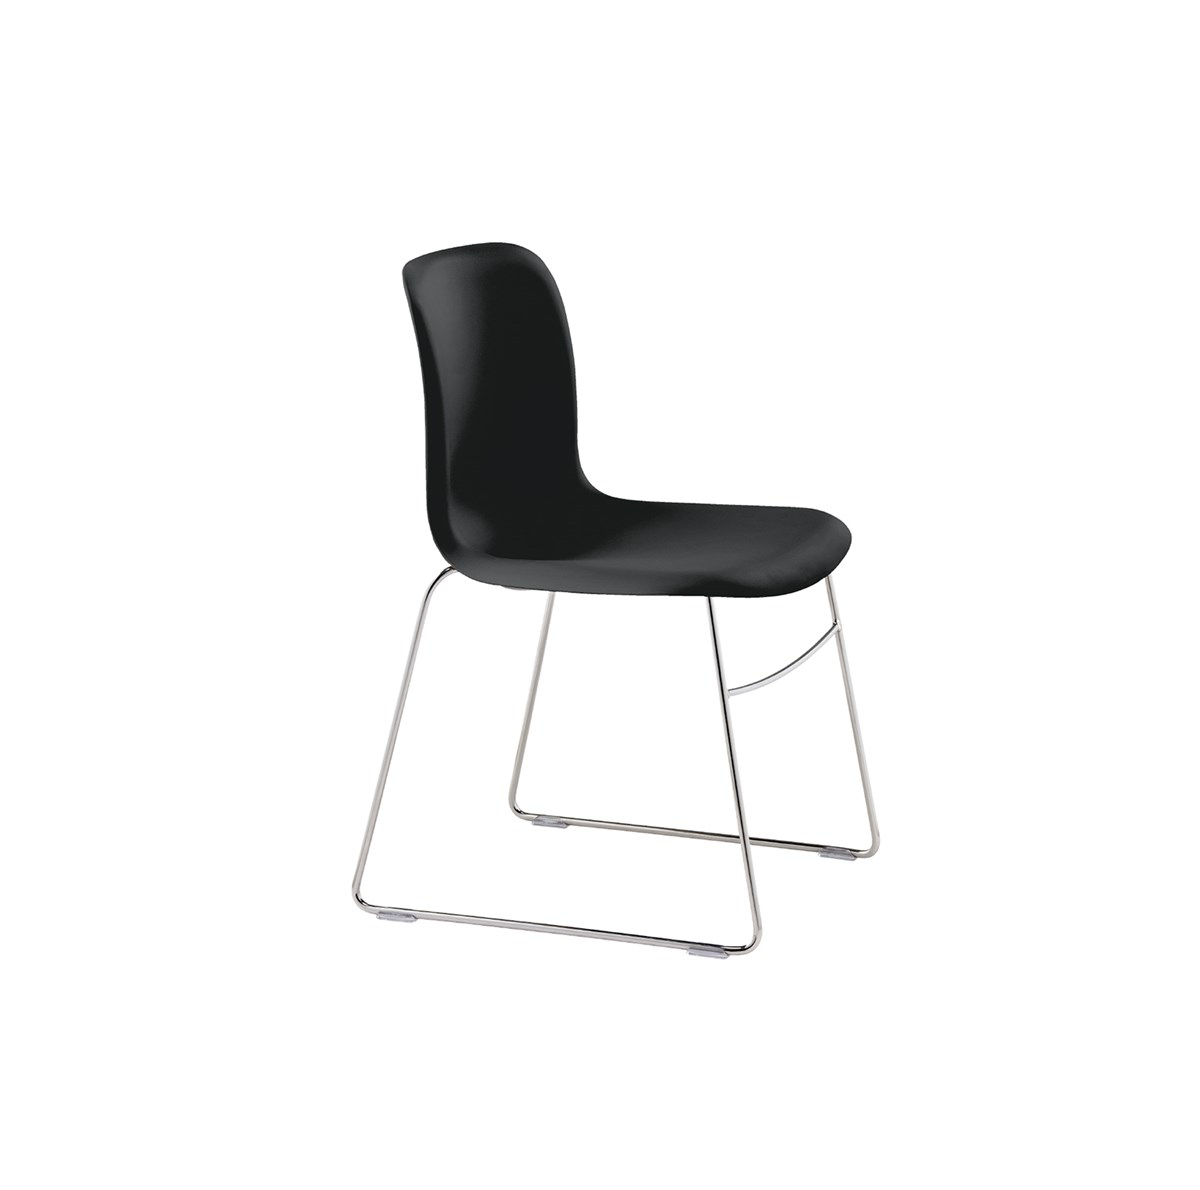 Howe-Pearson-Lloyd-Sixe-Chair-Matisse-1